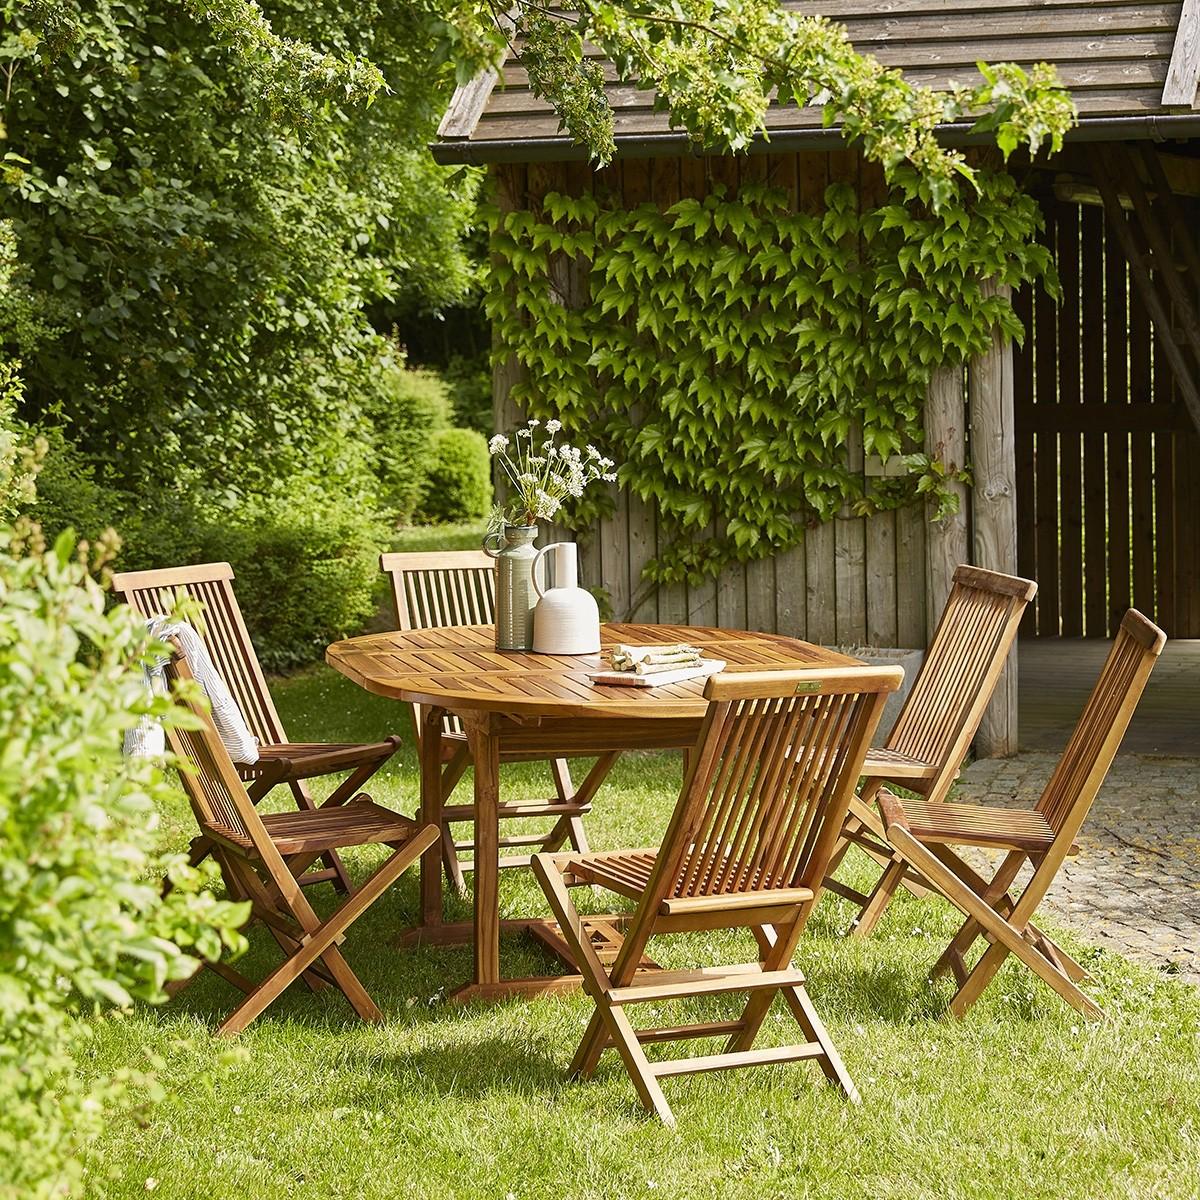 Salon de jardin ovale en teck huilé 6/8 places BALI | Bois ...